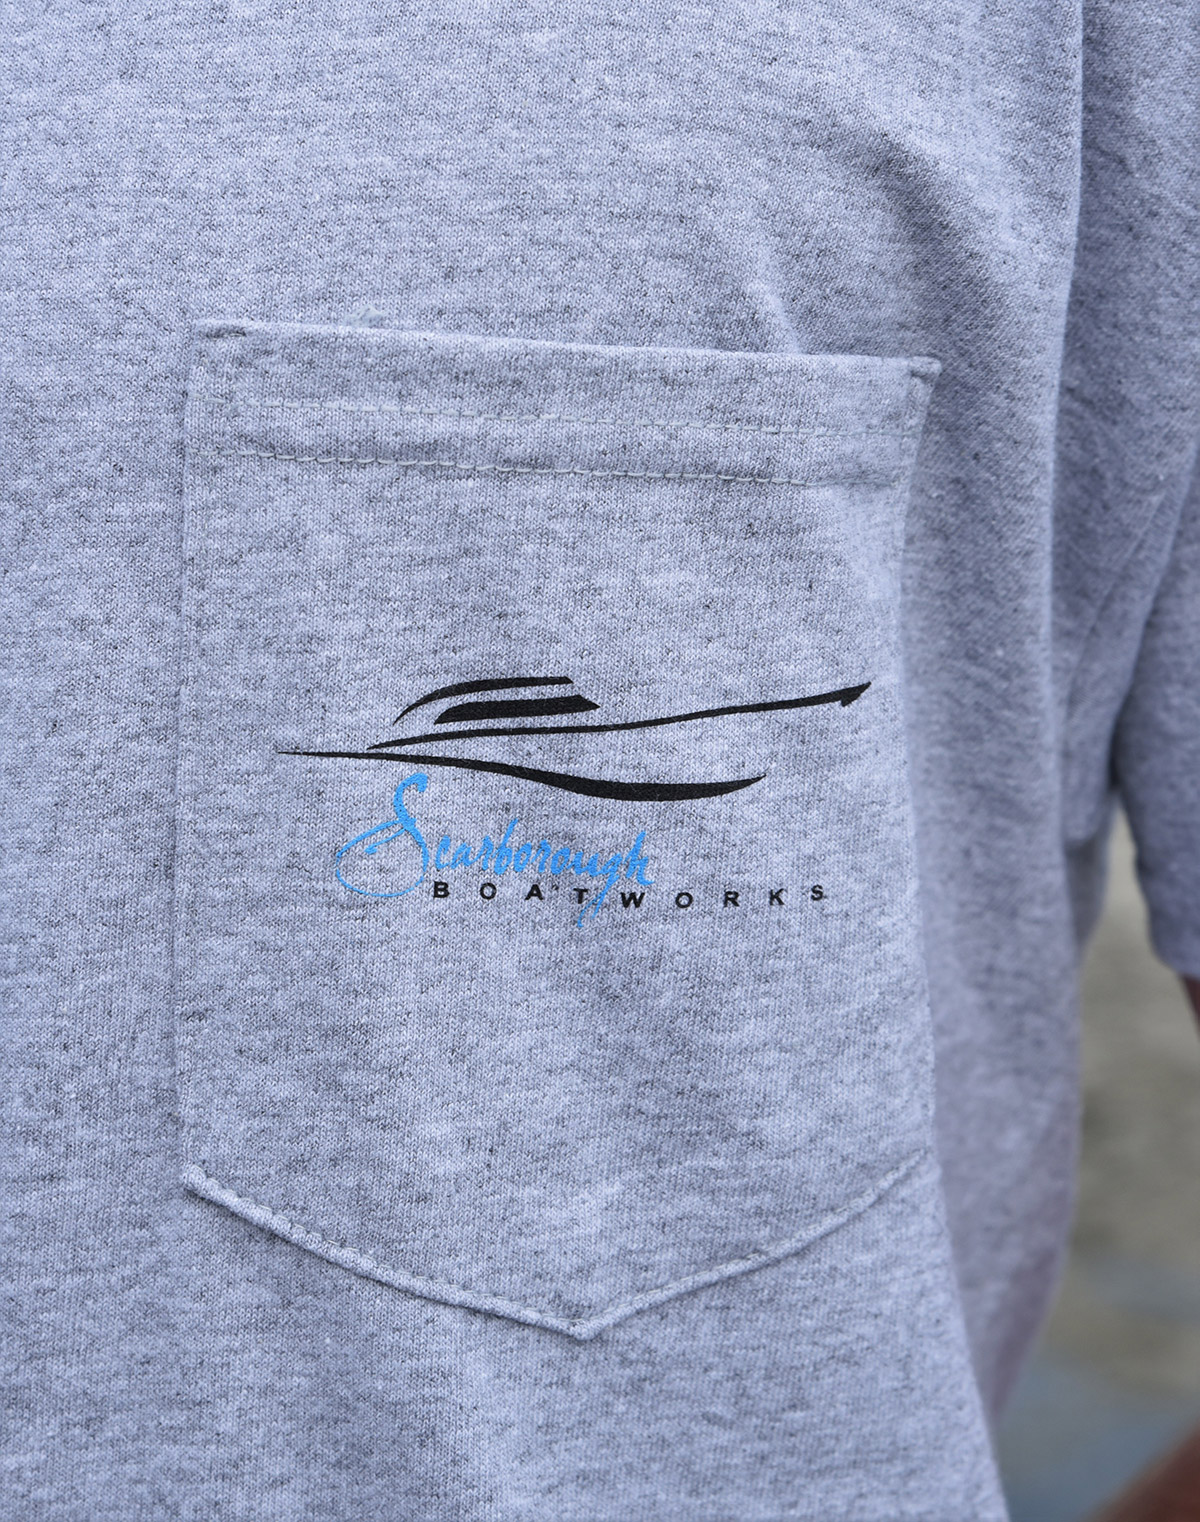 scarborough-boatworks-merchandise-GAL_5976-gray-tshirt